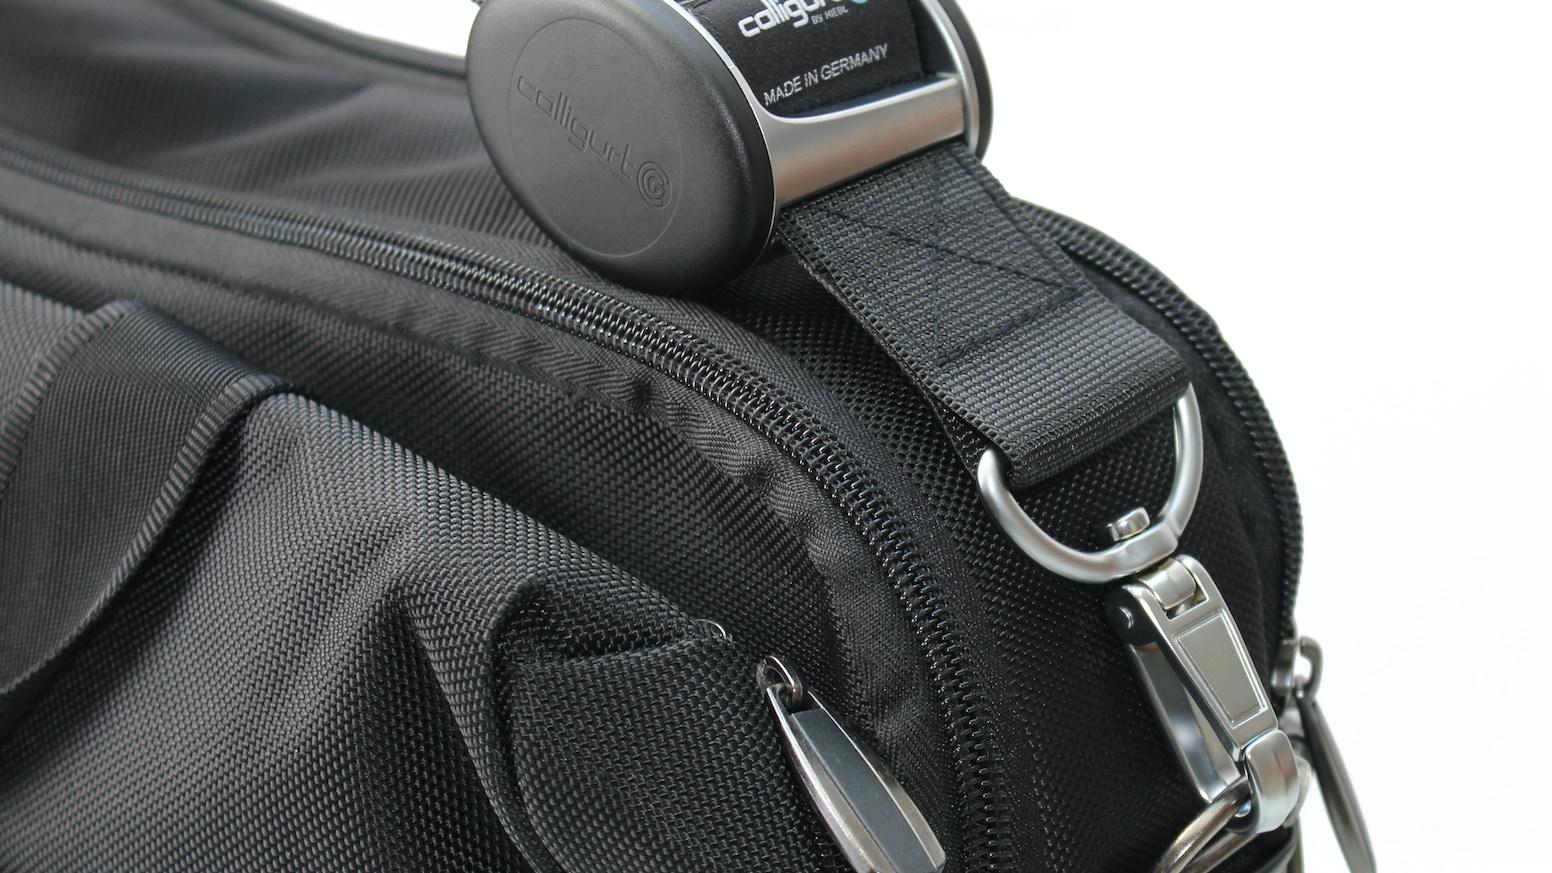 Shoulder Strap Innovation For Laptop Sport And Golf Bags